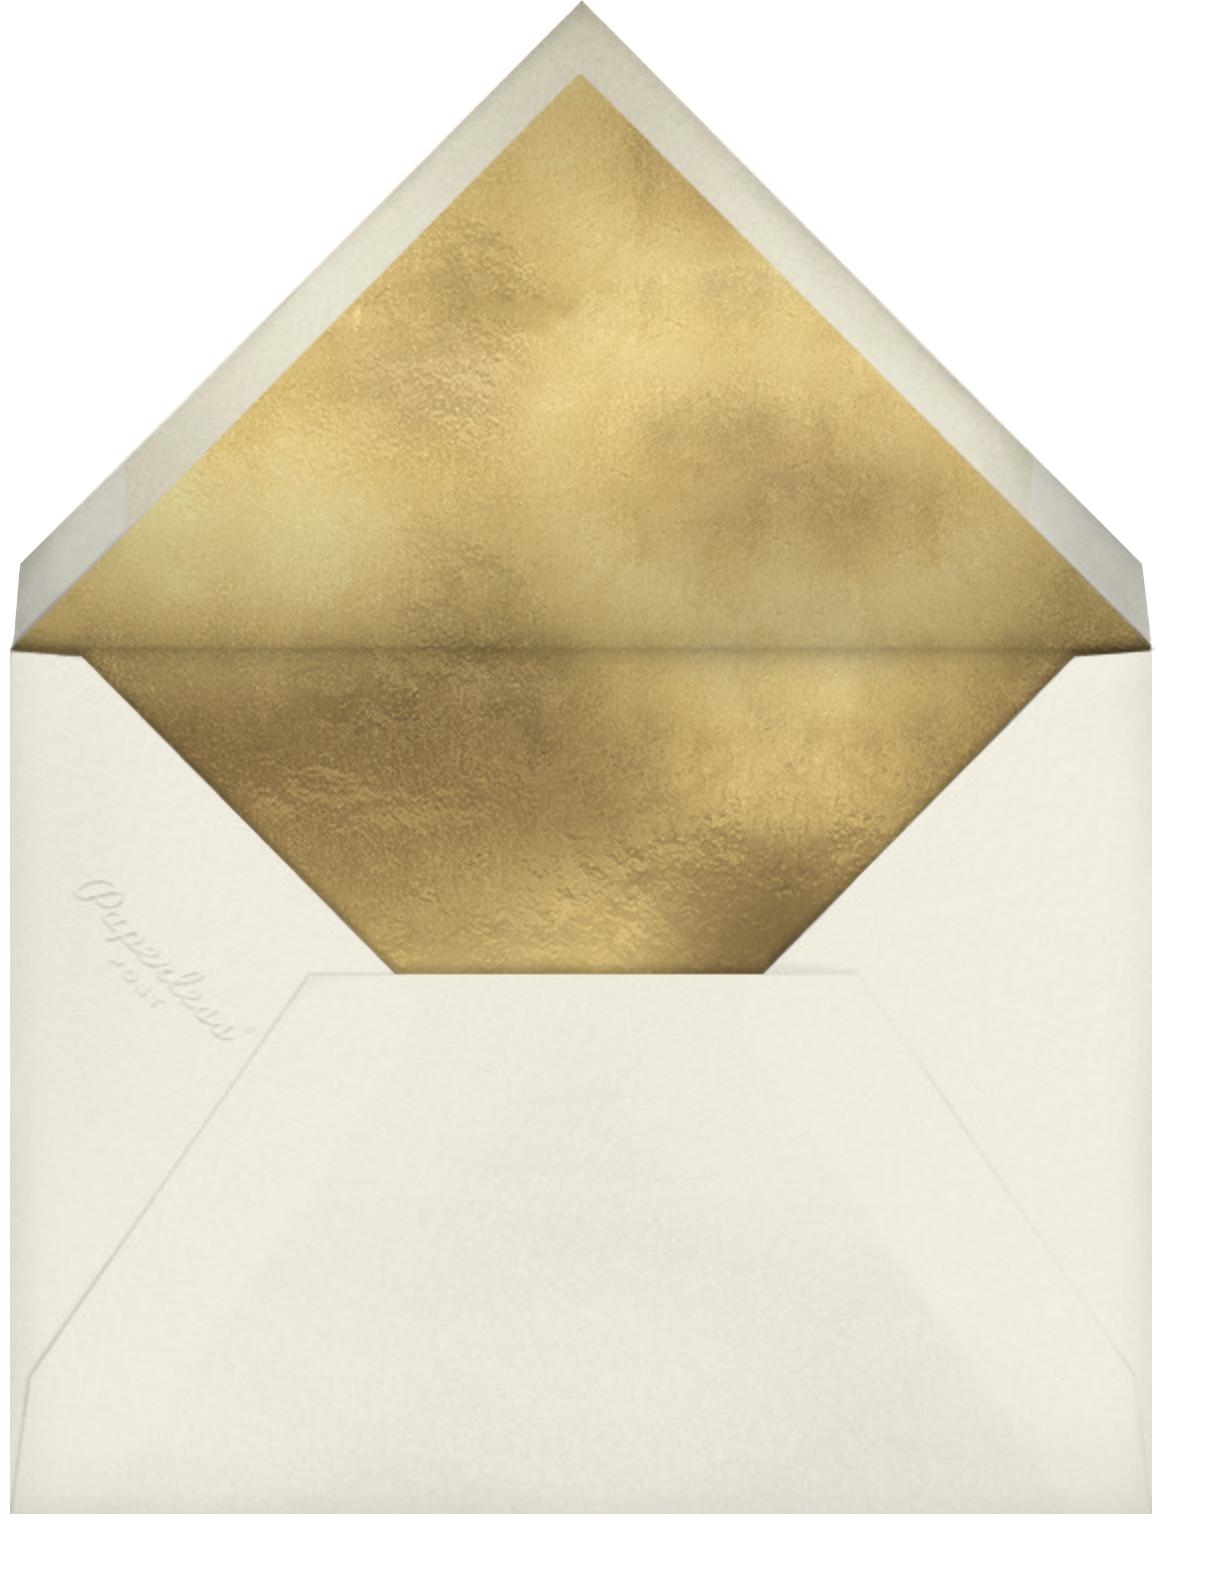 Clover and Over Photo - Cadet - kate spade new york - Envelope